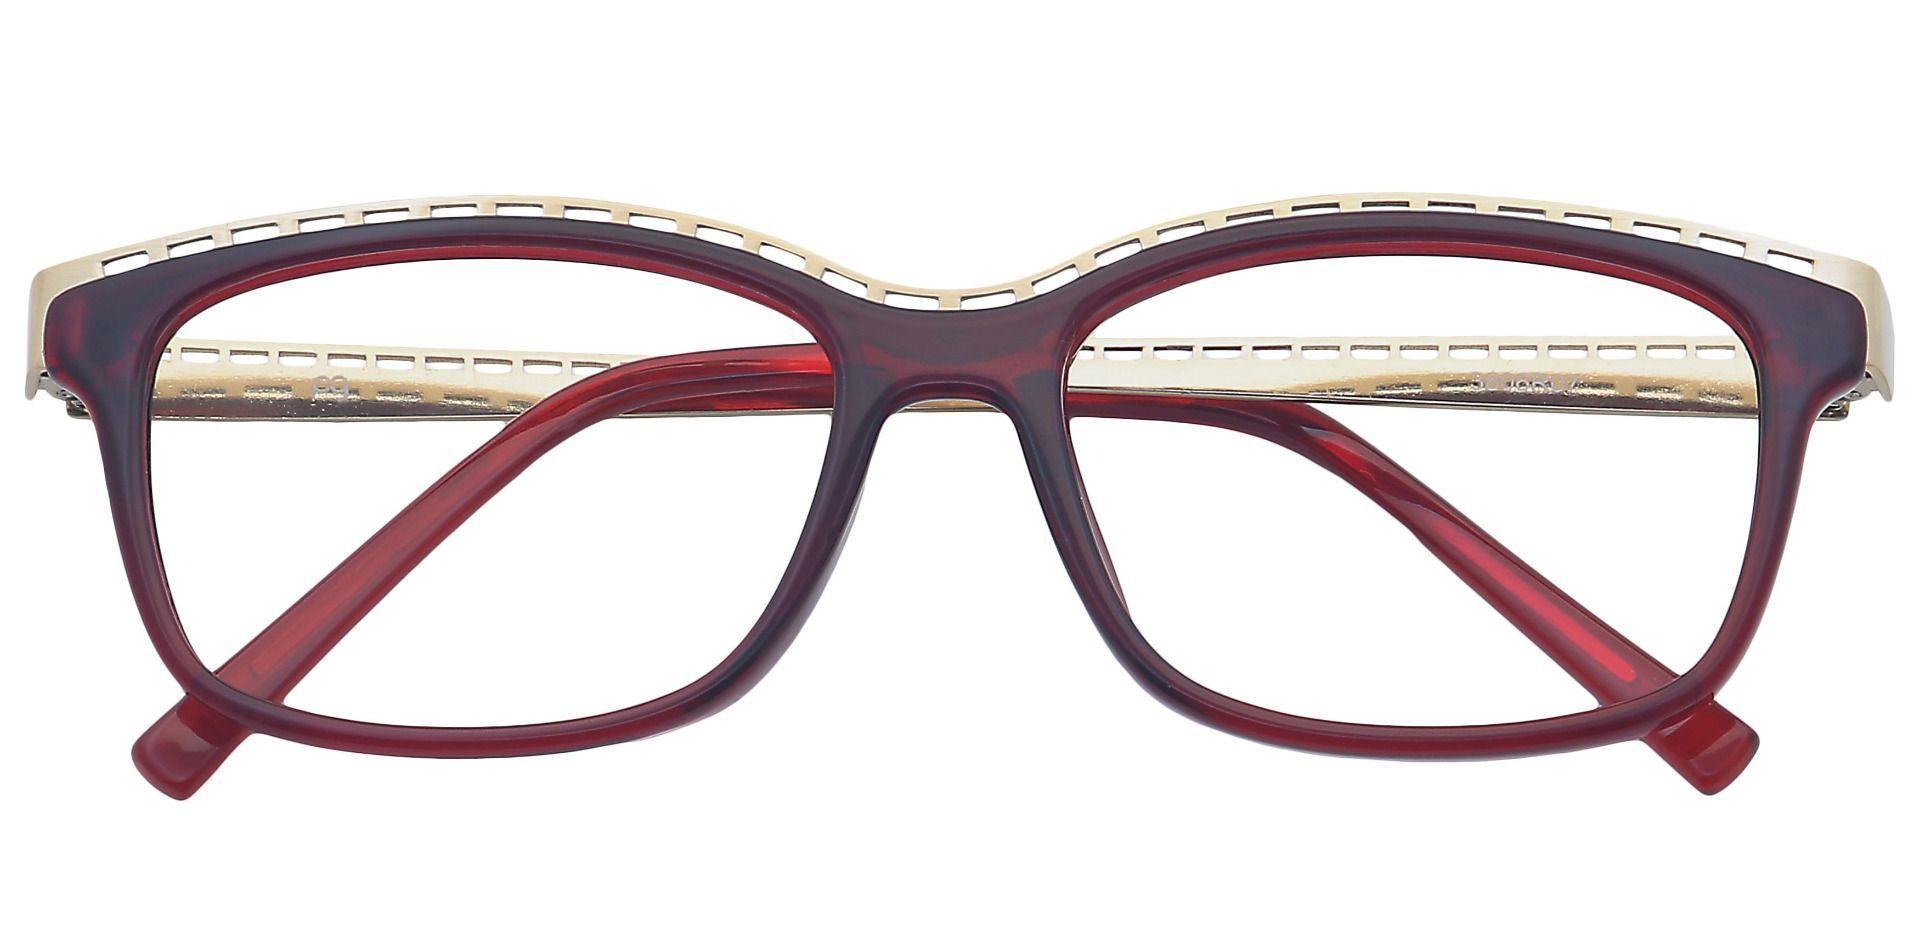 Richie Rectangle Prescription Glasses - Red